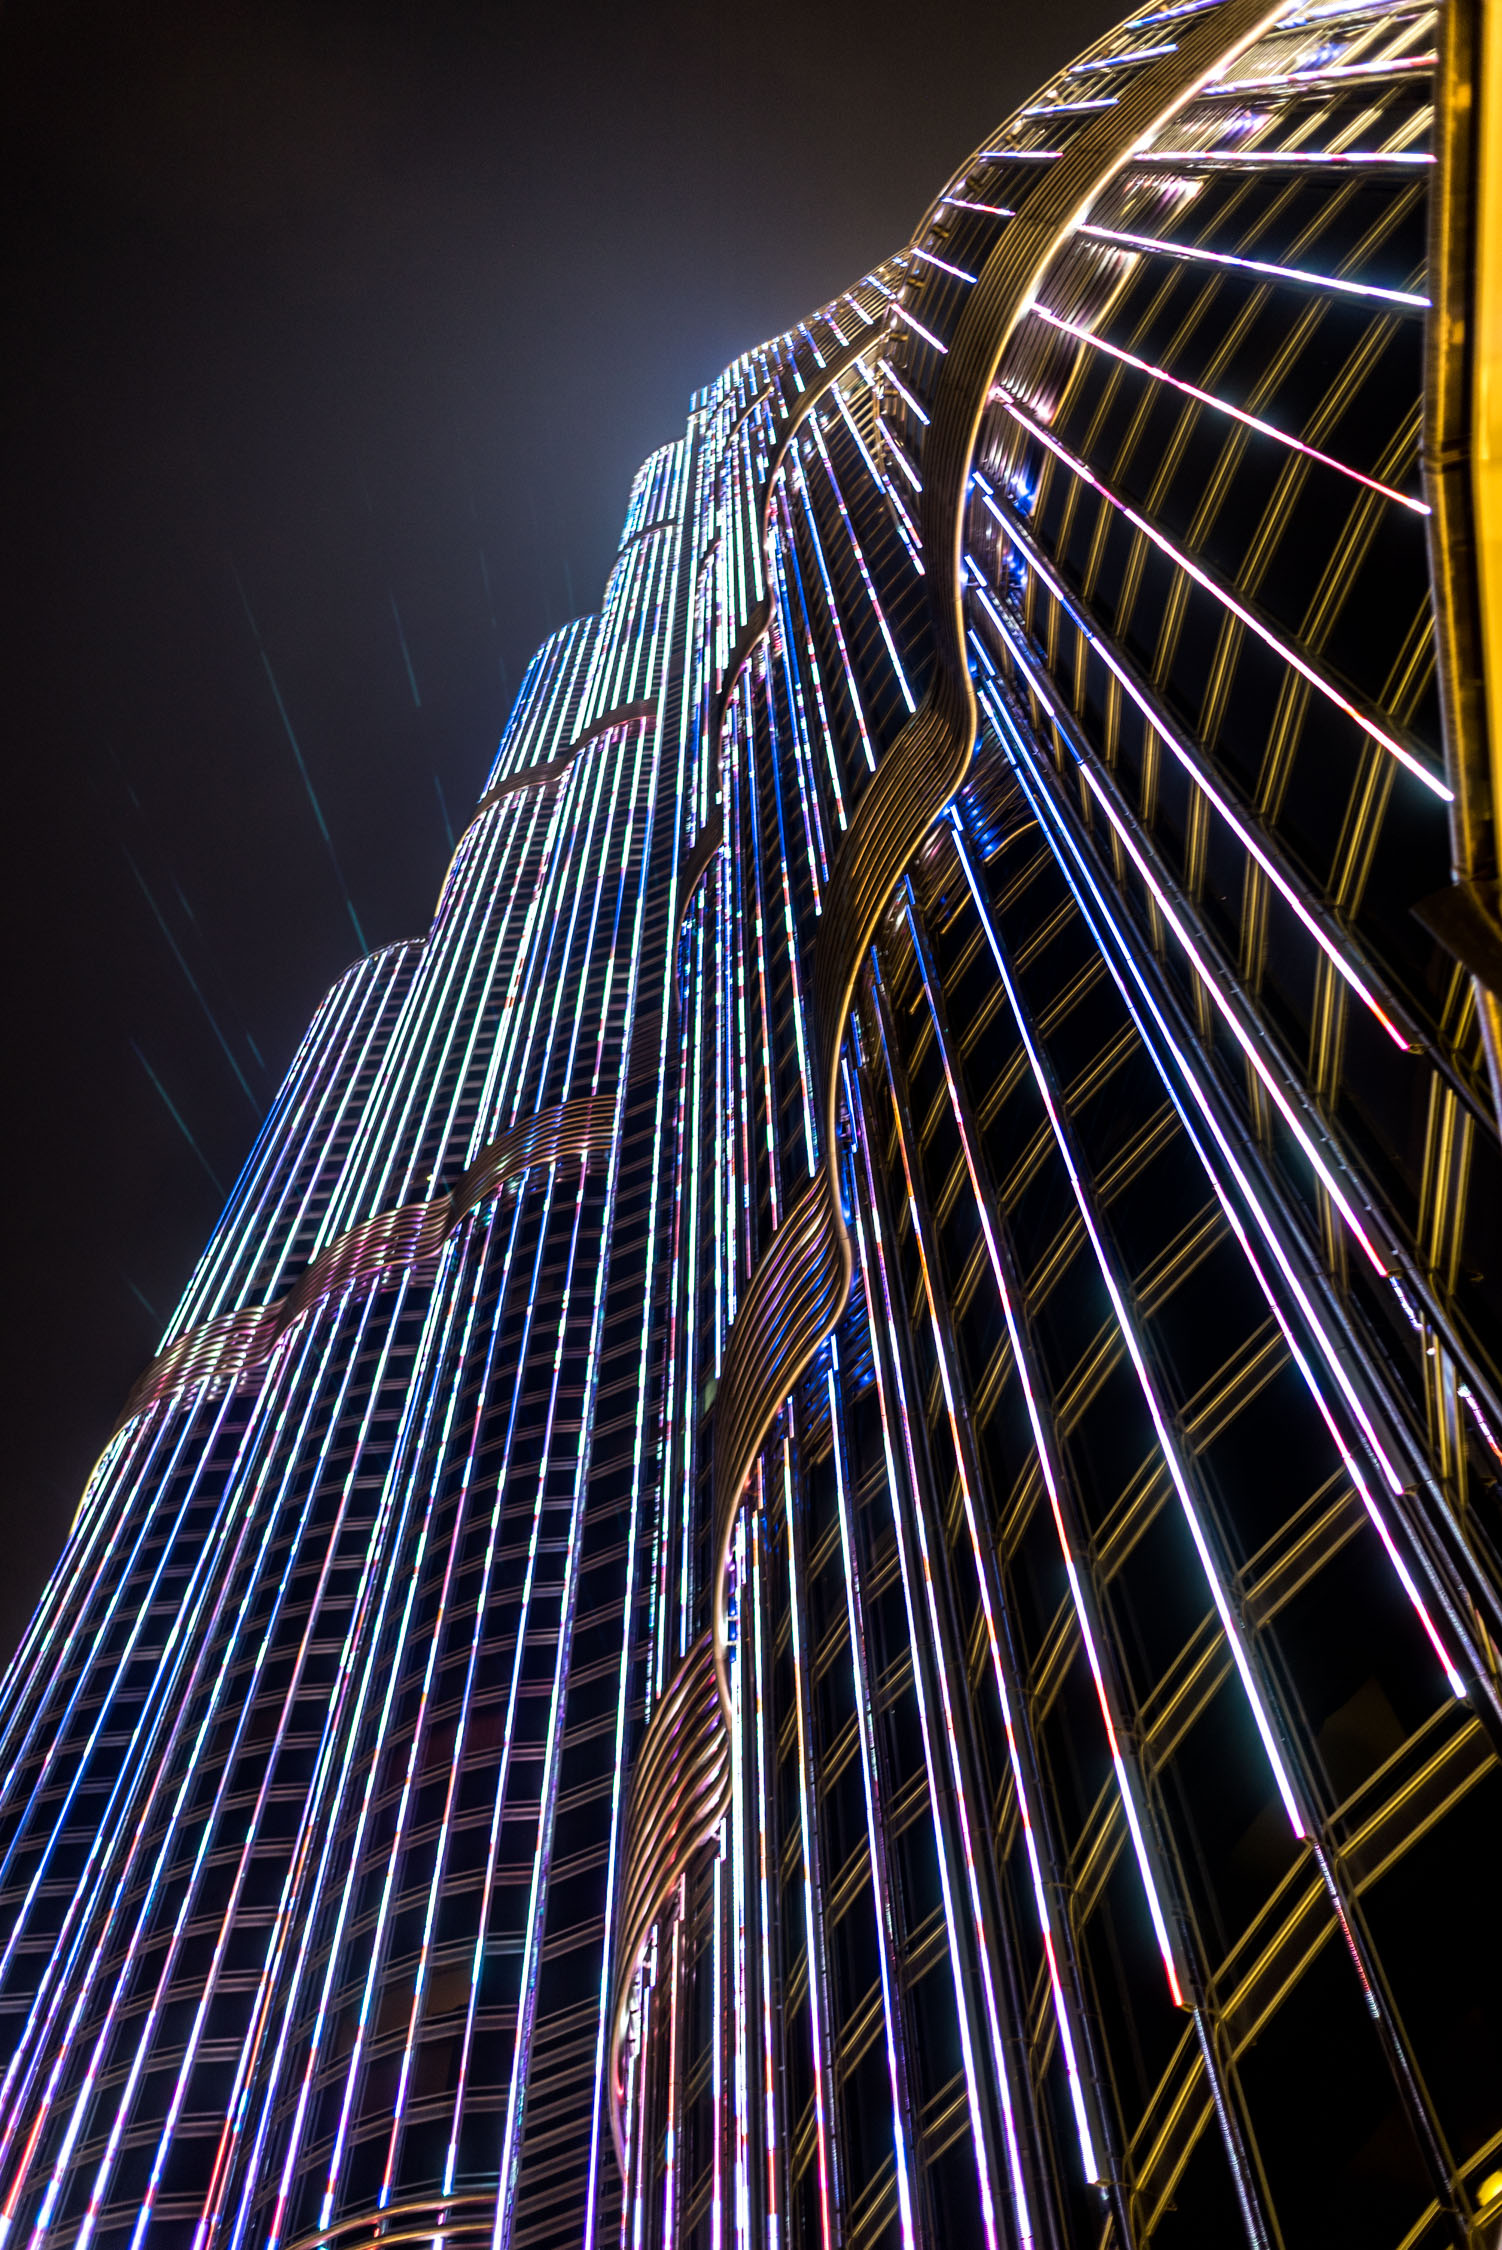 Dubai-229-20180417.jpg